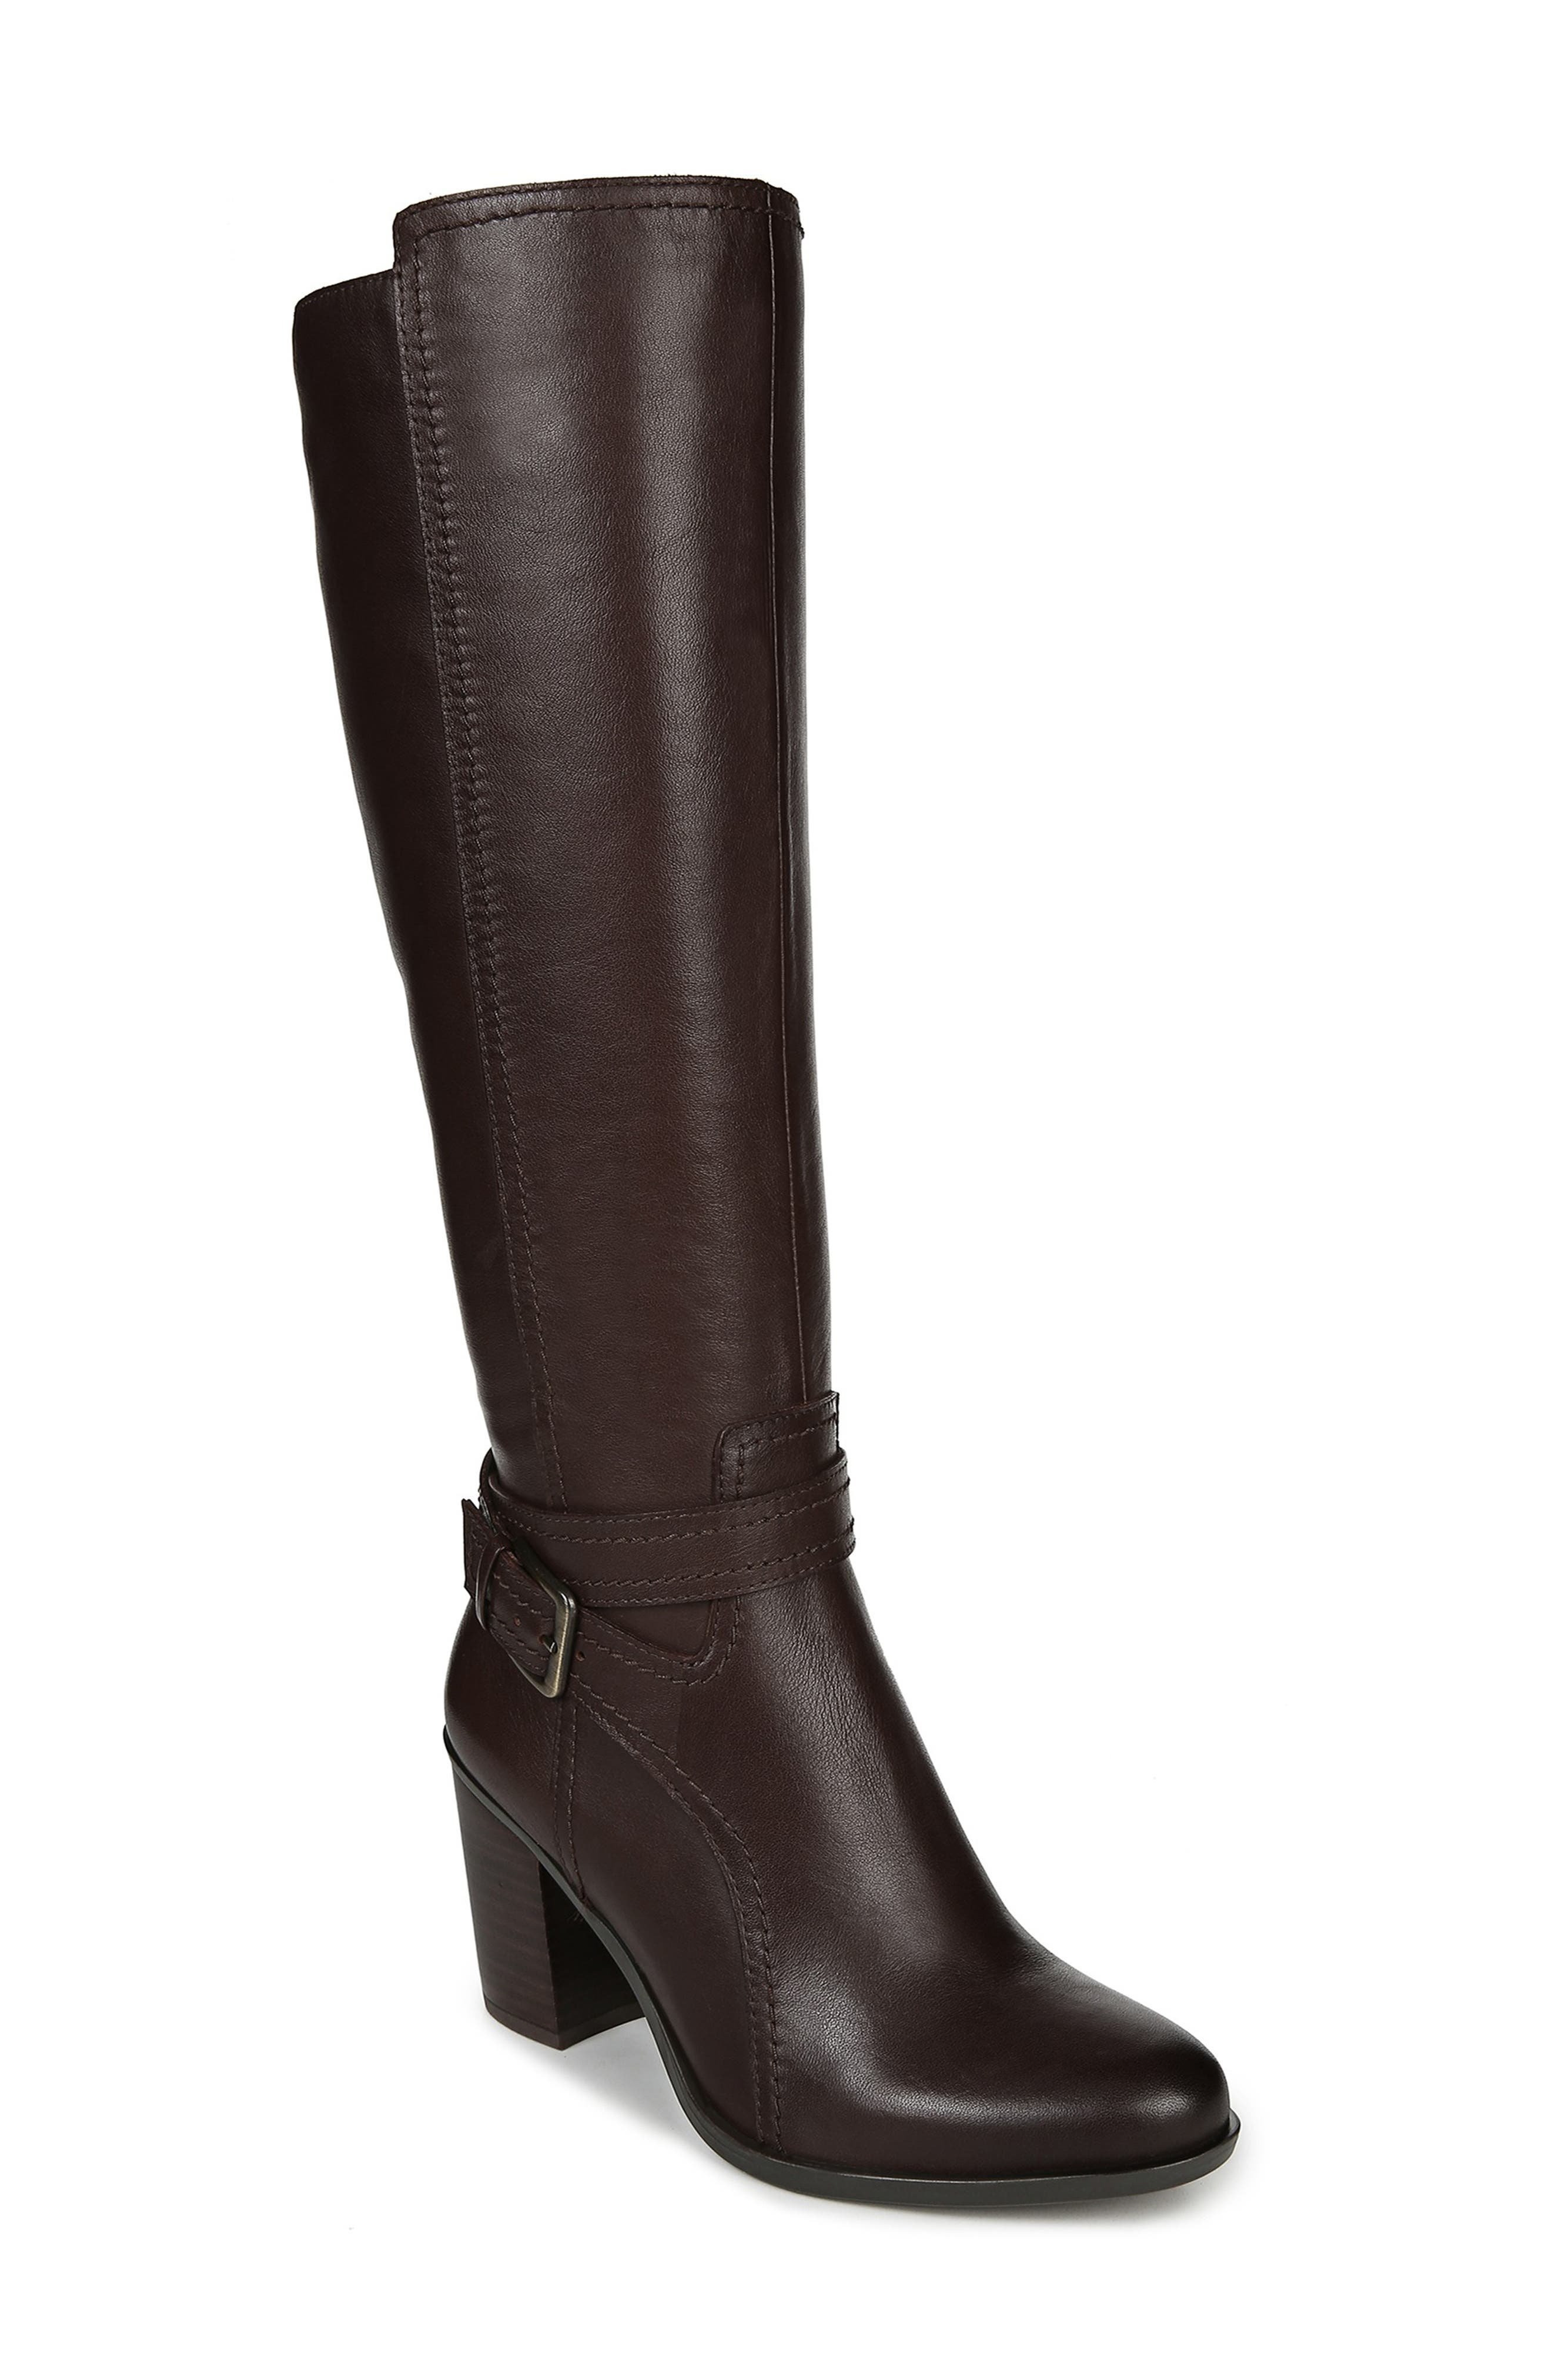 Naturalizer Kelsey Knee High Boot, Wide Calf- Brown